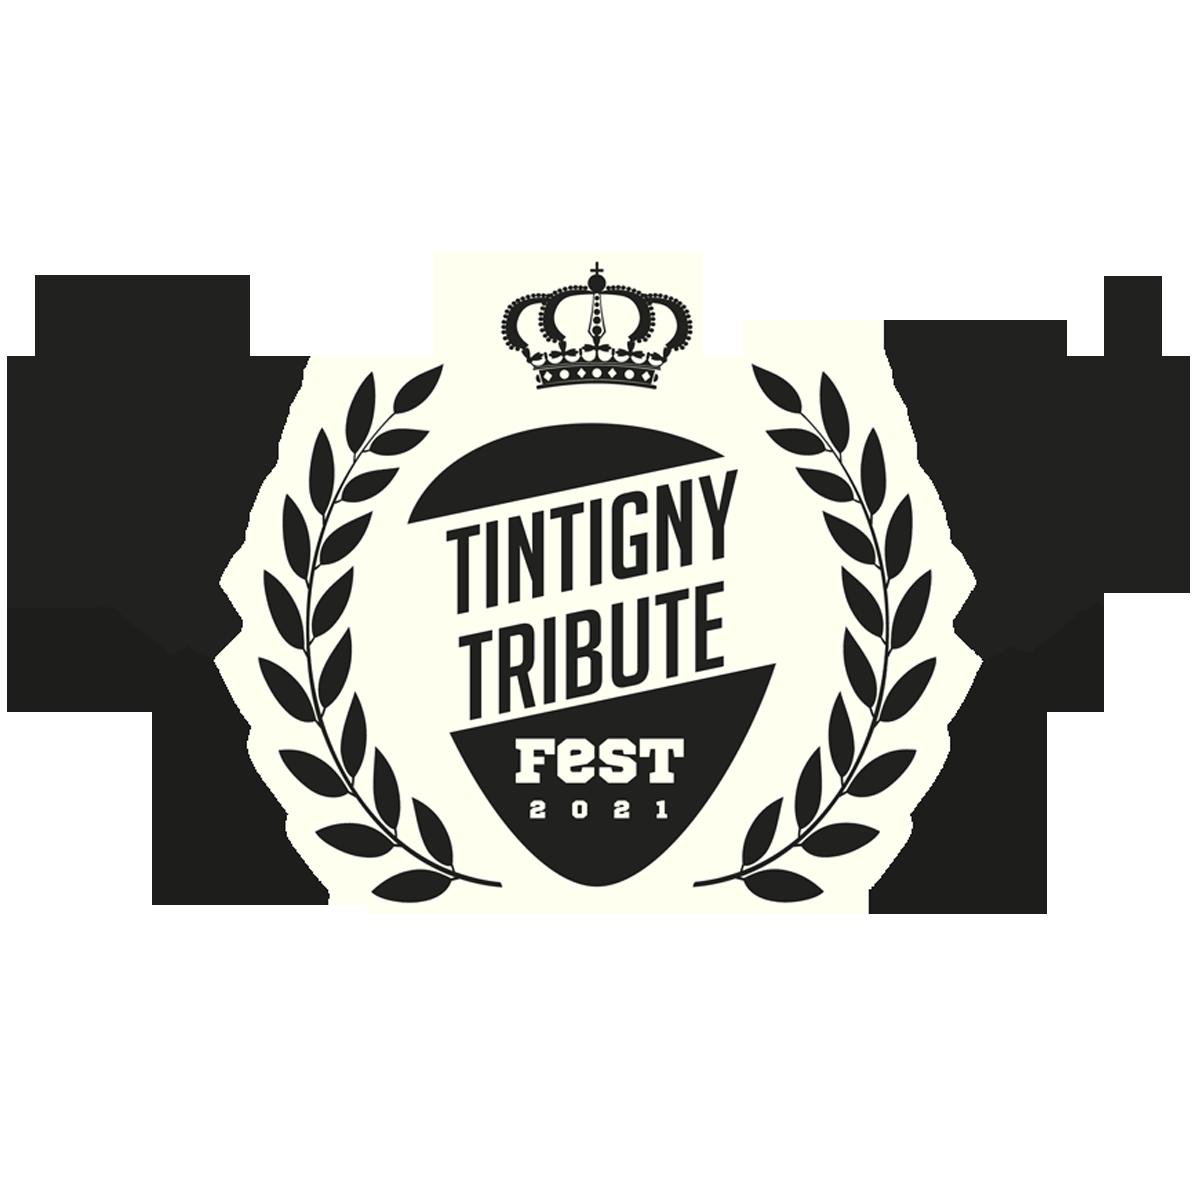 Tintigy Tribute Festival